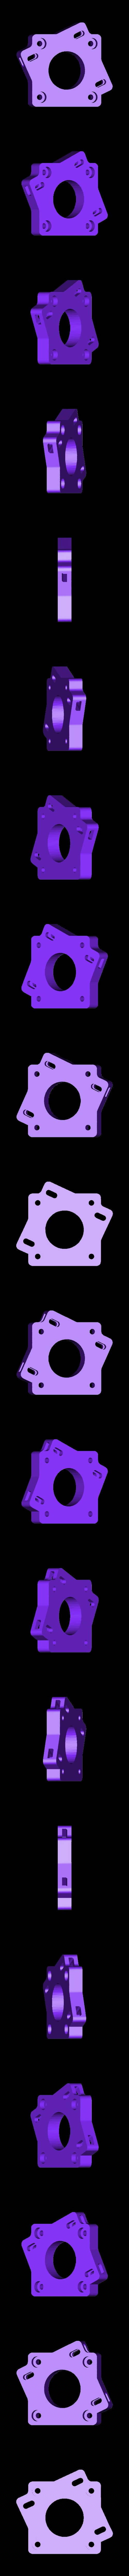 X-Motor-Tensioner.STL Download free STL file Prusa MK3, MK2S X-Axis Belt Tensioner • 3D print object, HoytDesign